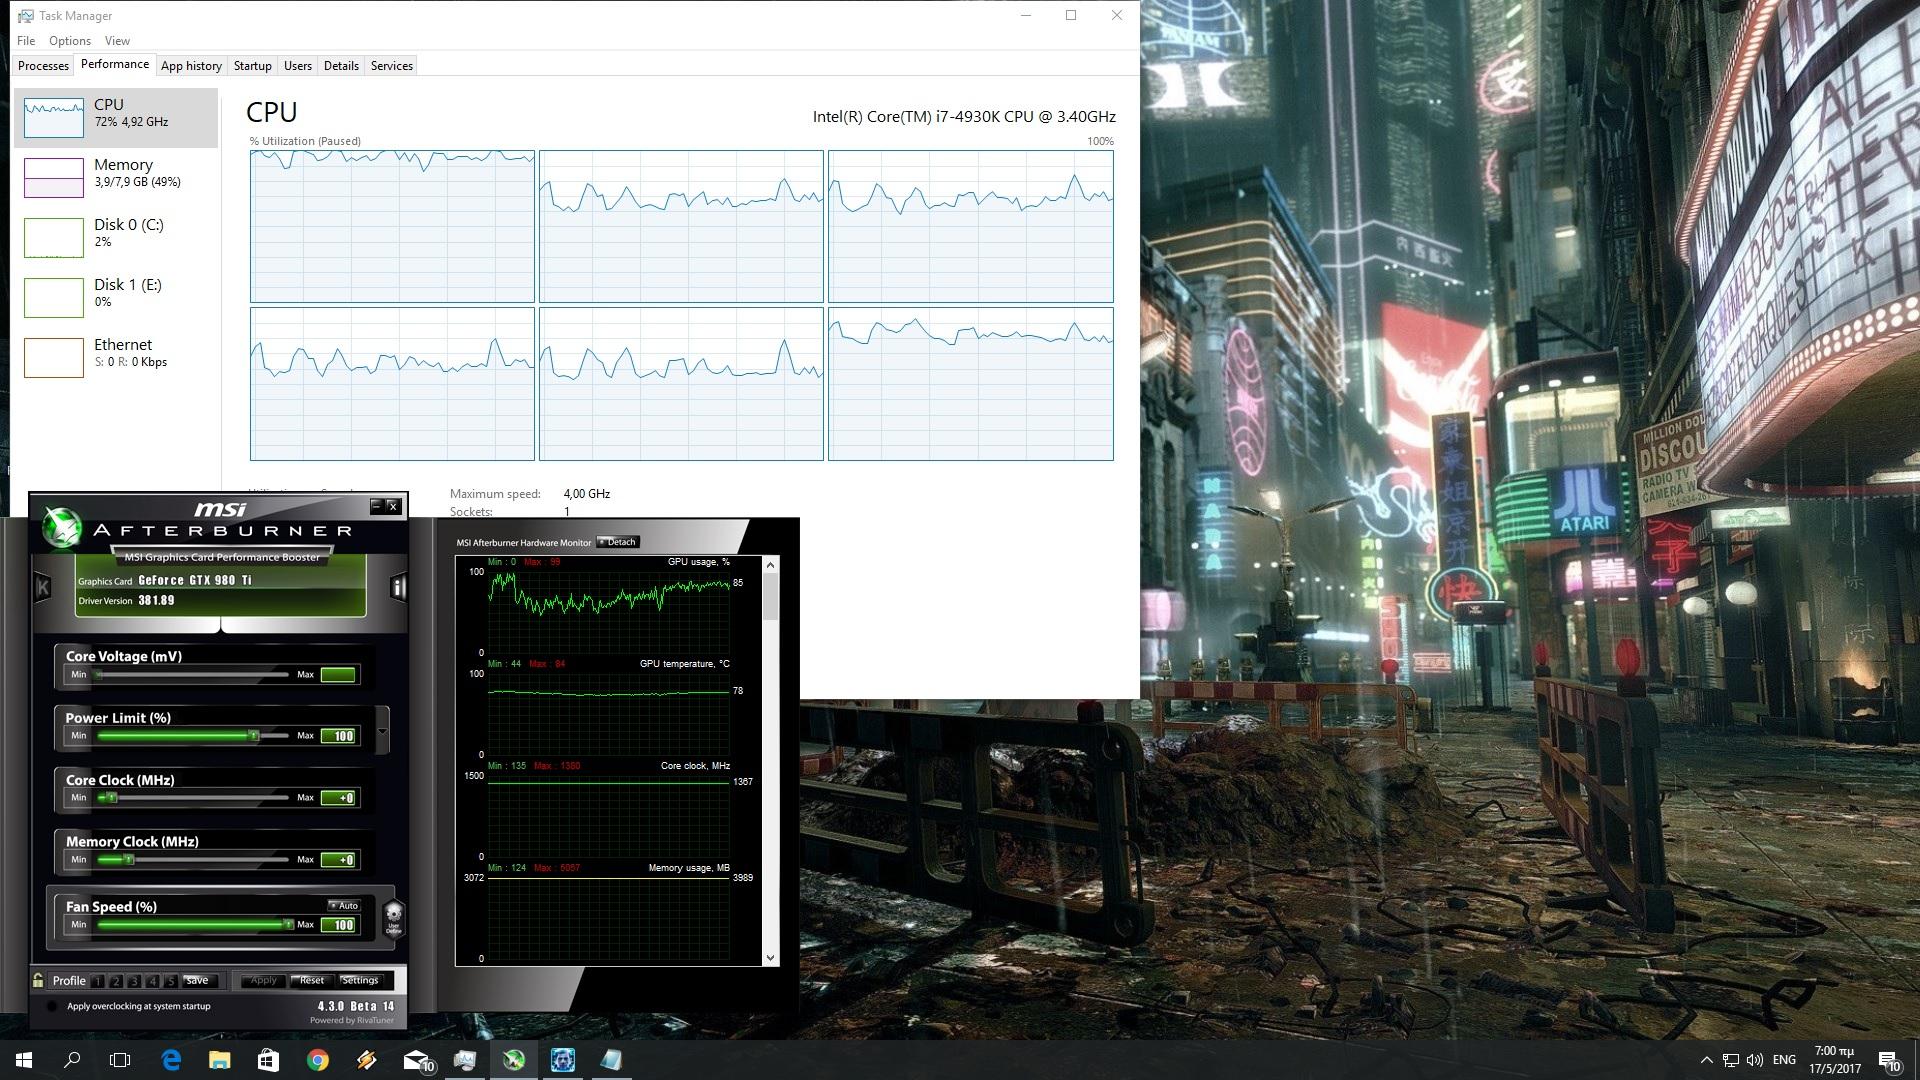 The Surge - PC Performance Analysis - DSOGaming